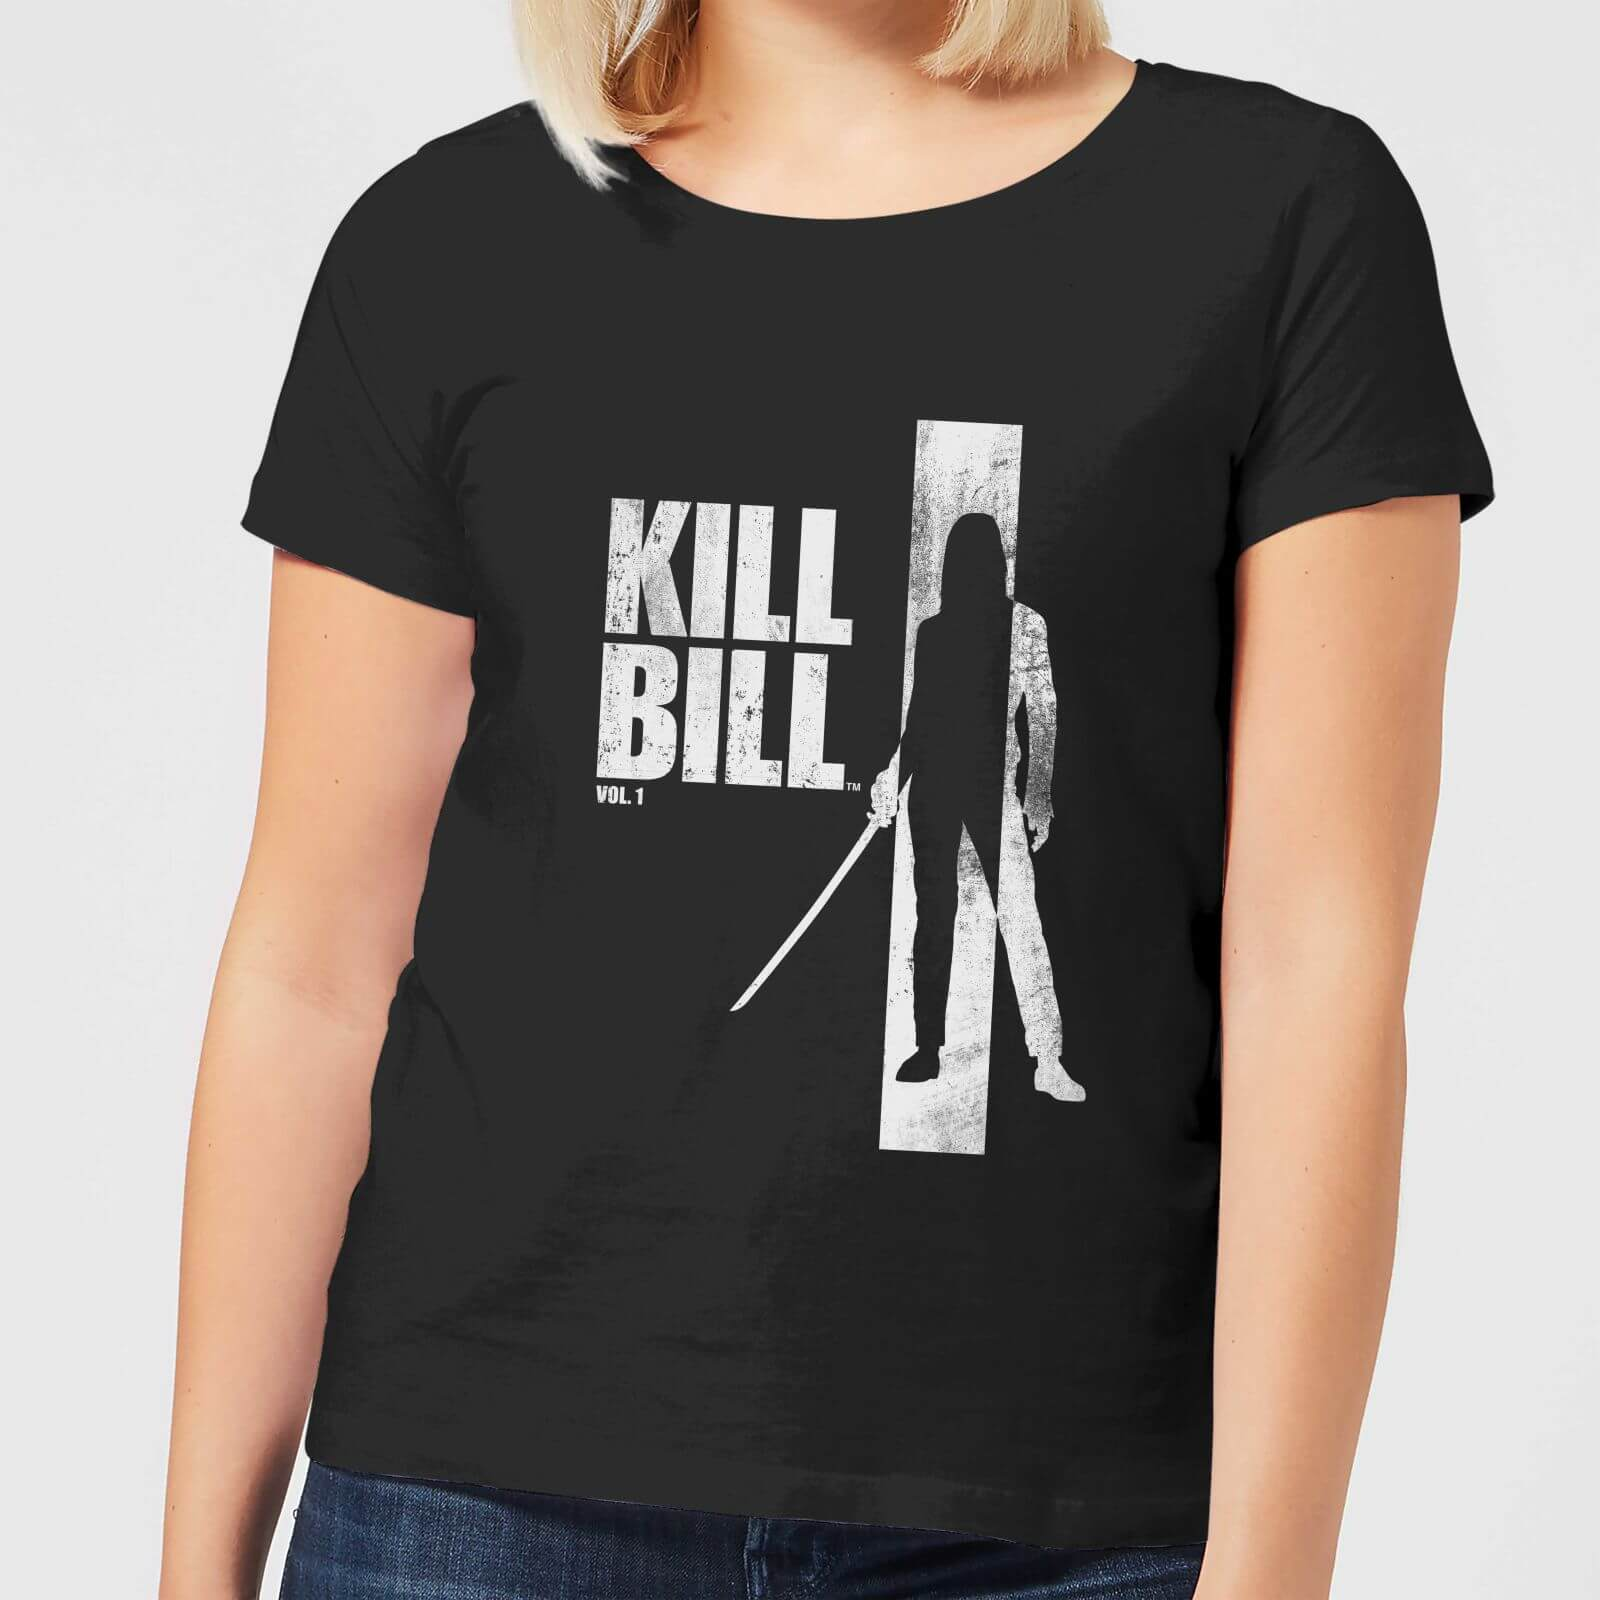 OfferteWeb.click 19-kill-bill-silhouette-women-s-t-shirt-black-m-nero